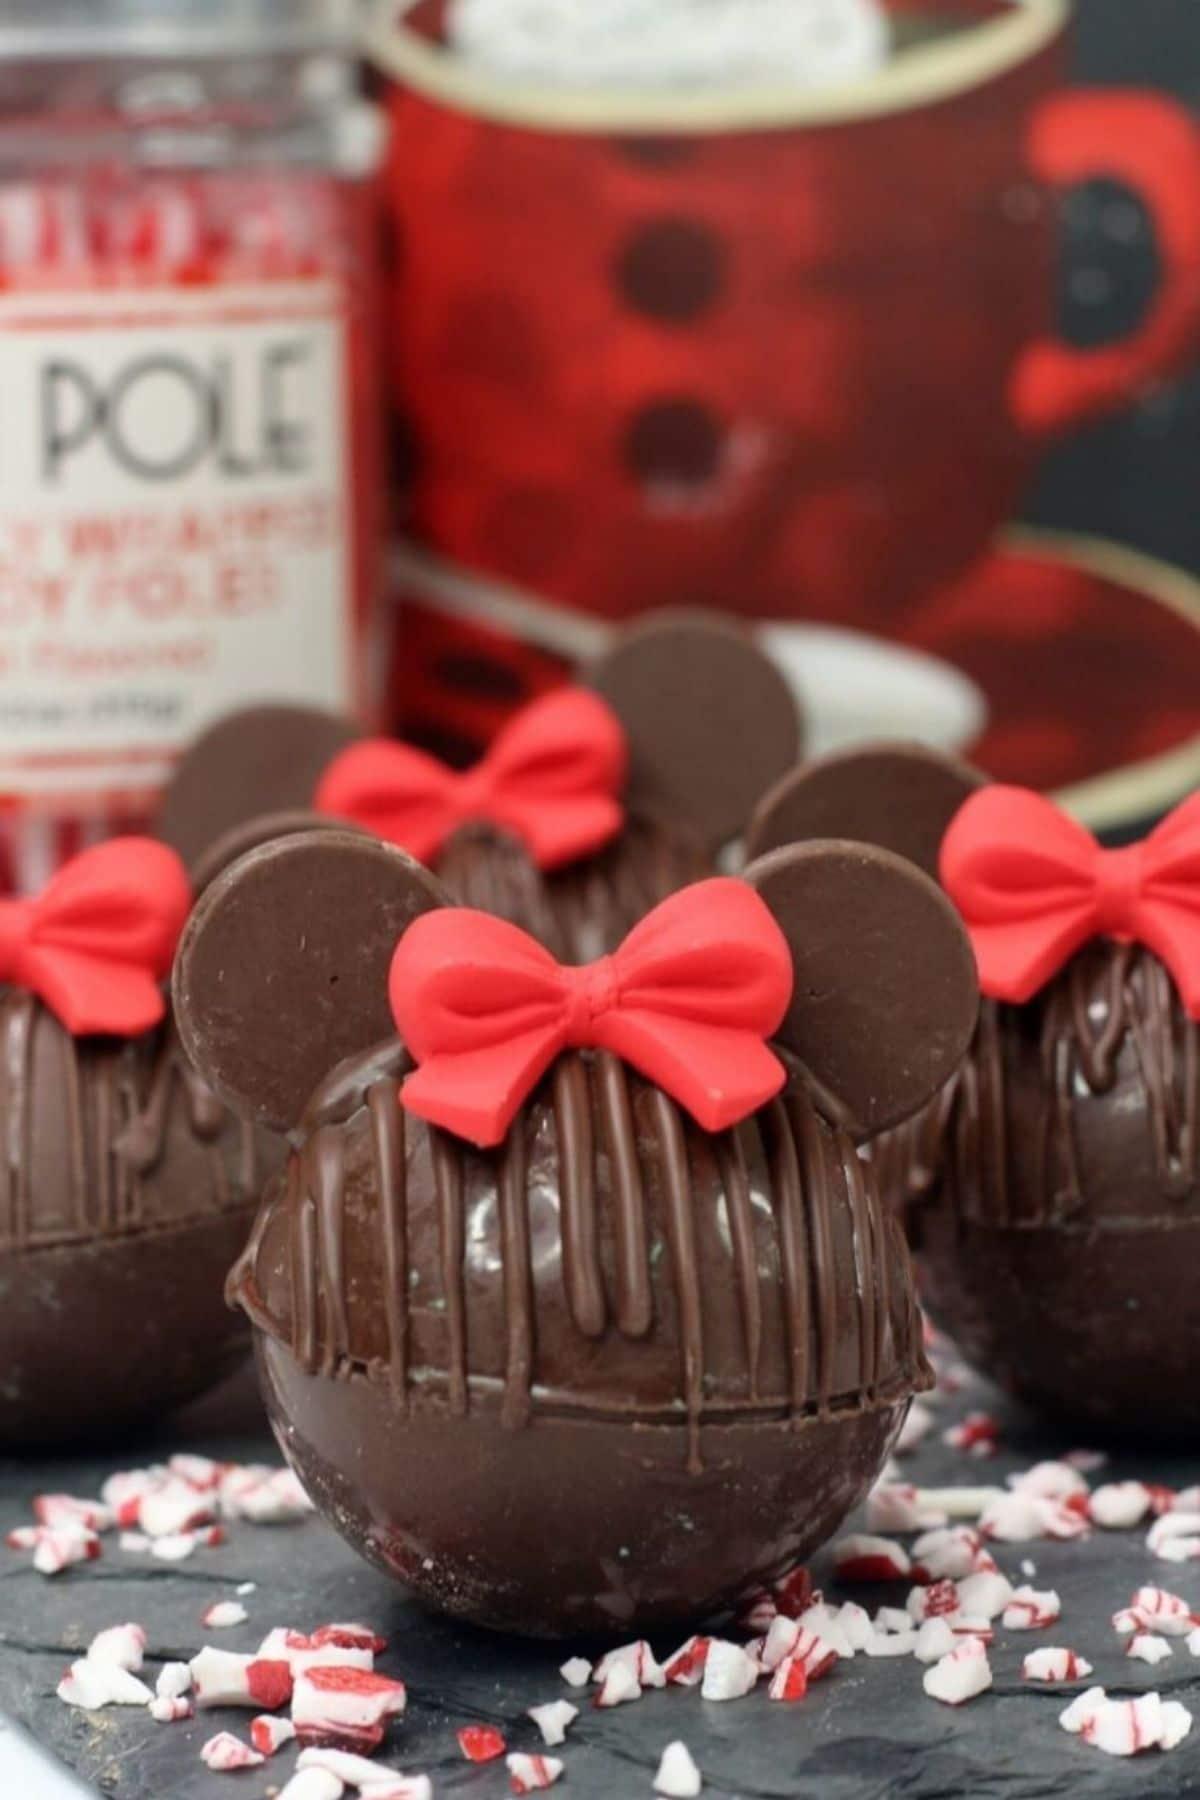 Minnie Mouse hot cocoa bomb